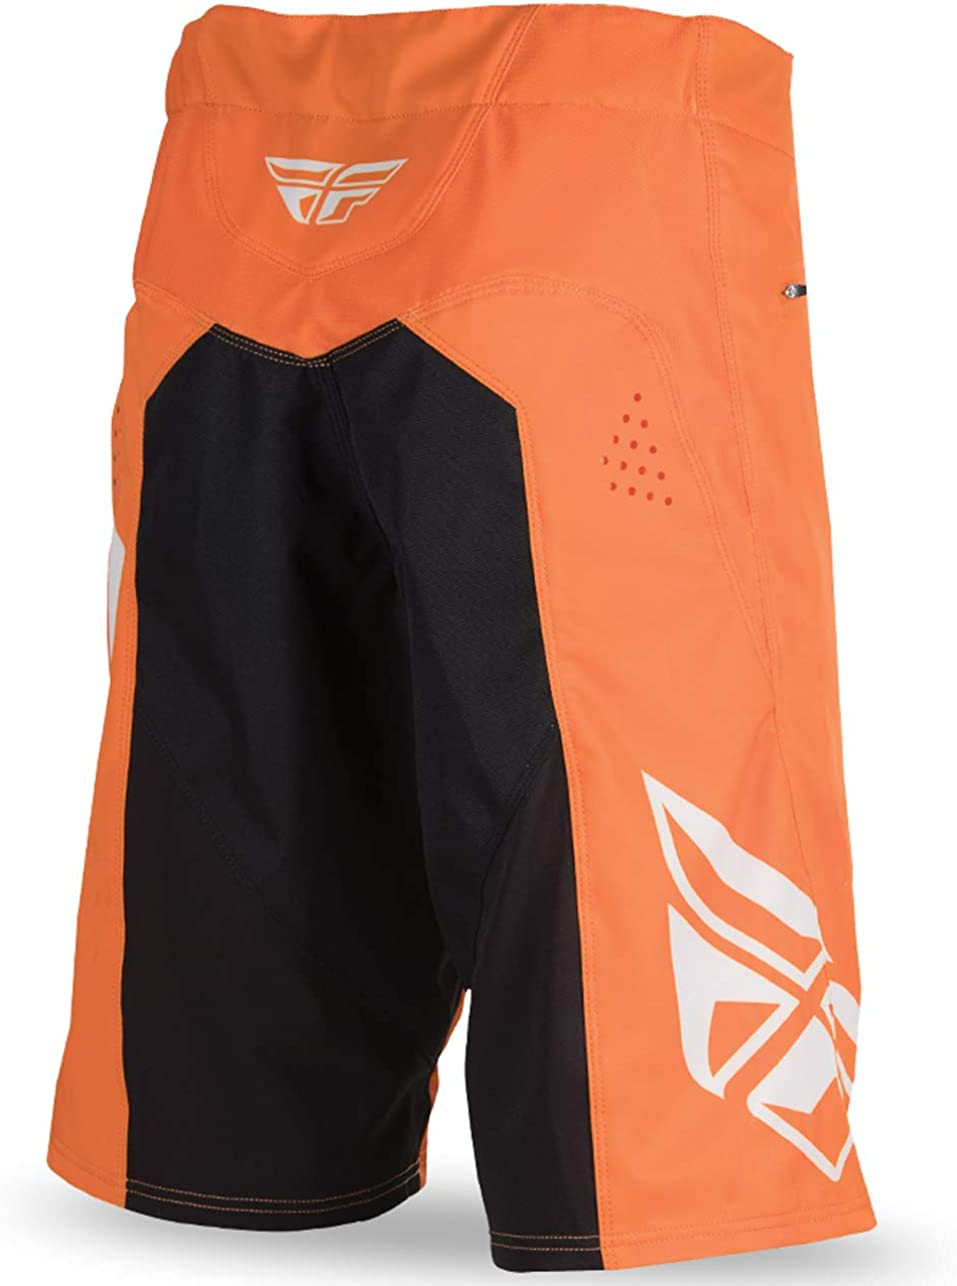 Fly Bike Radium MTB Mountain Bike Adult Short Orange//White